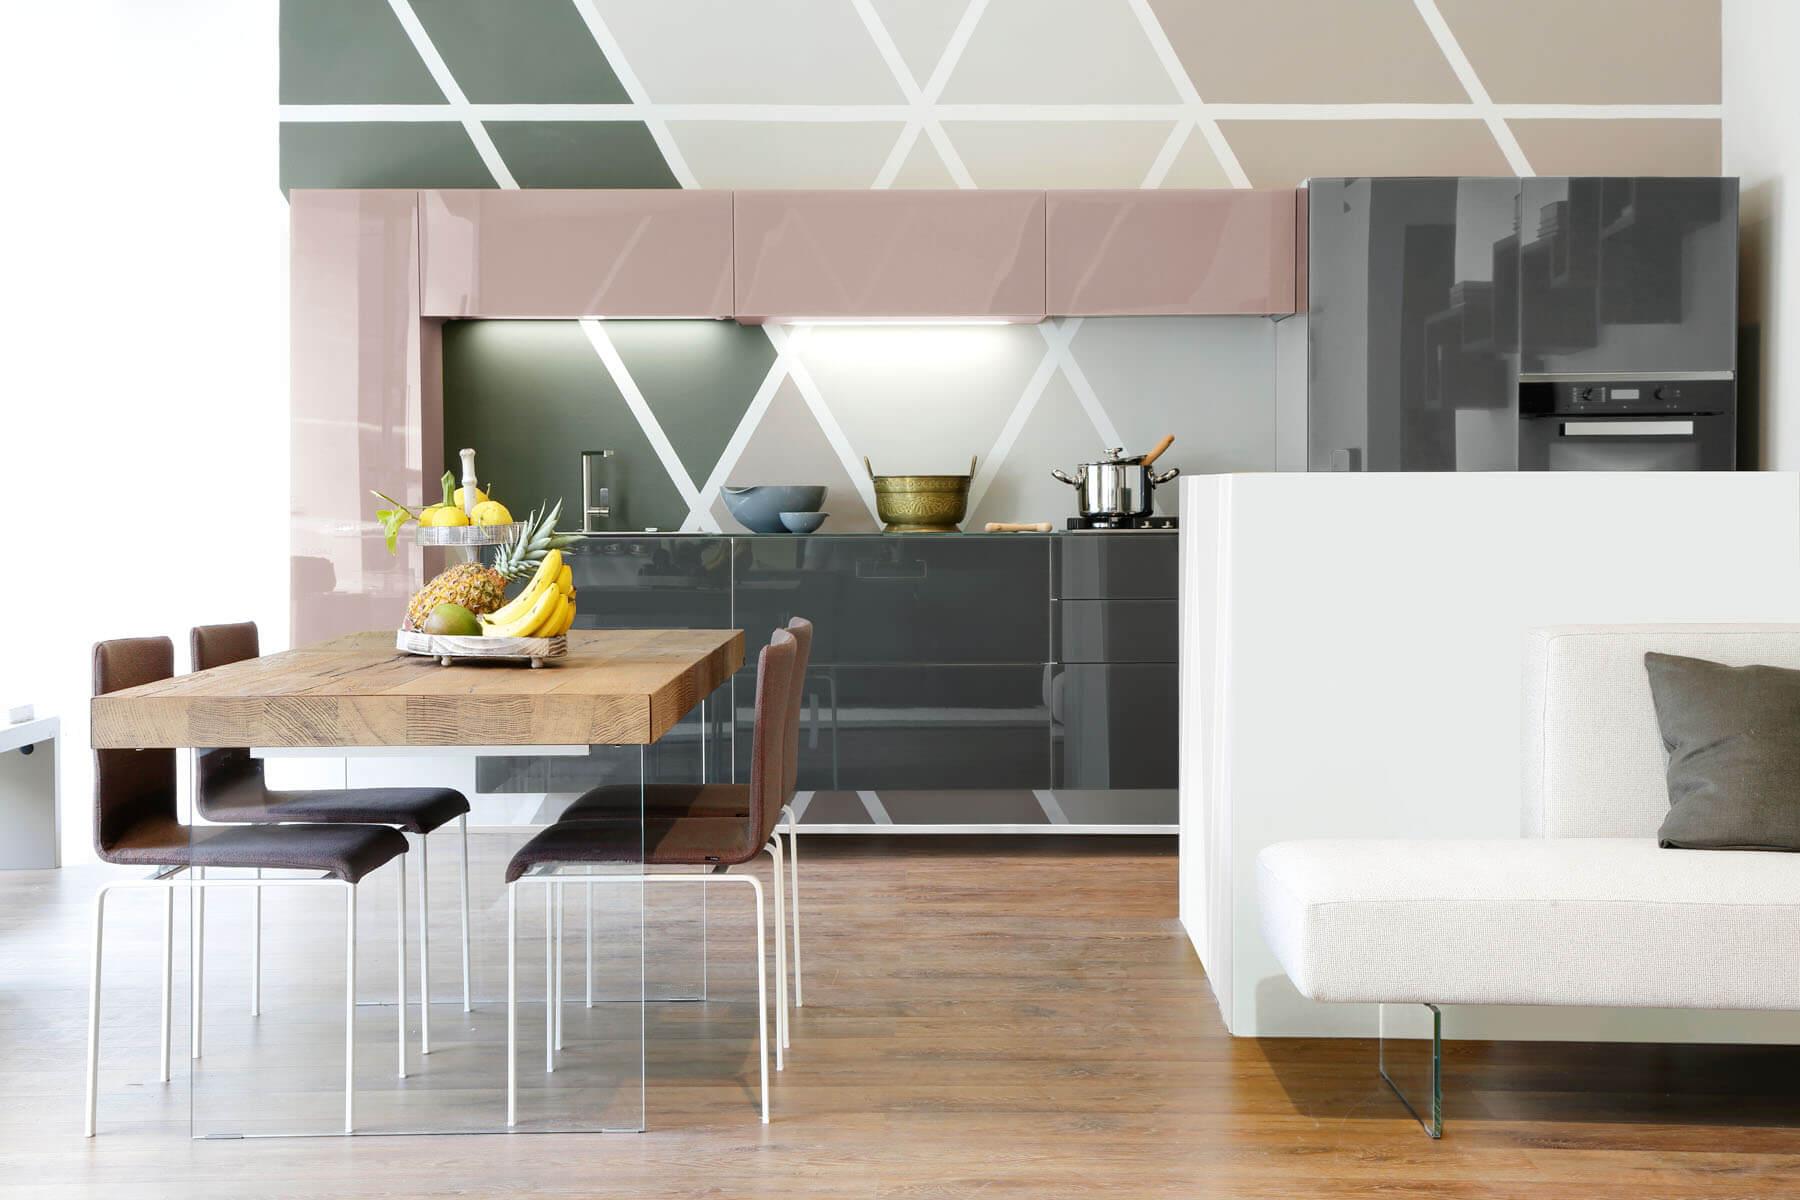 sedia-dangla-con-cucina